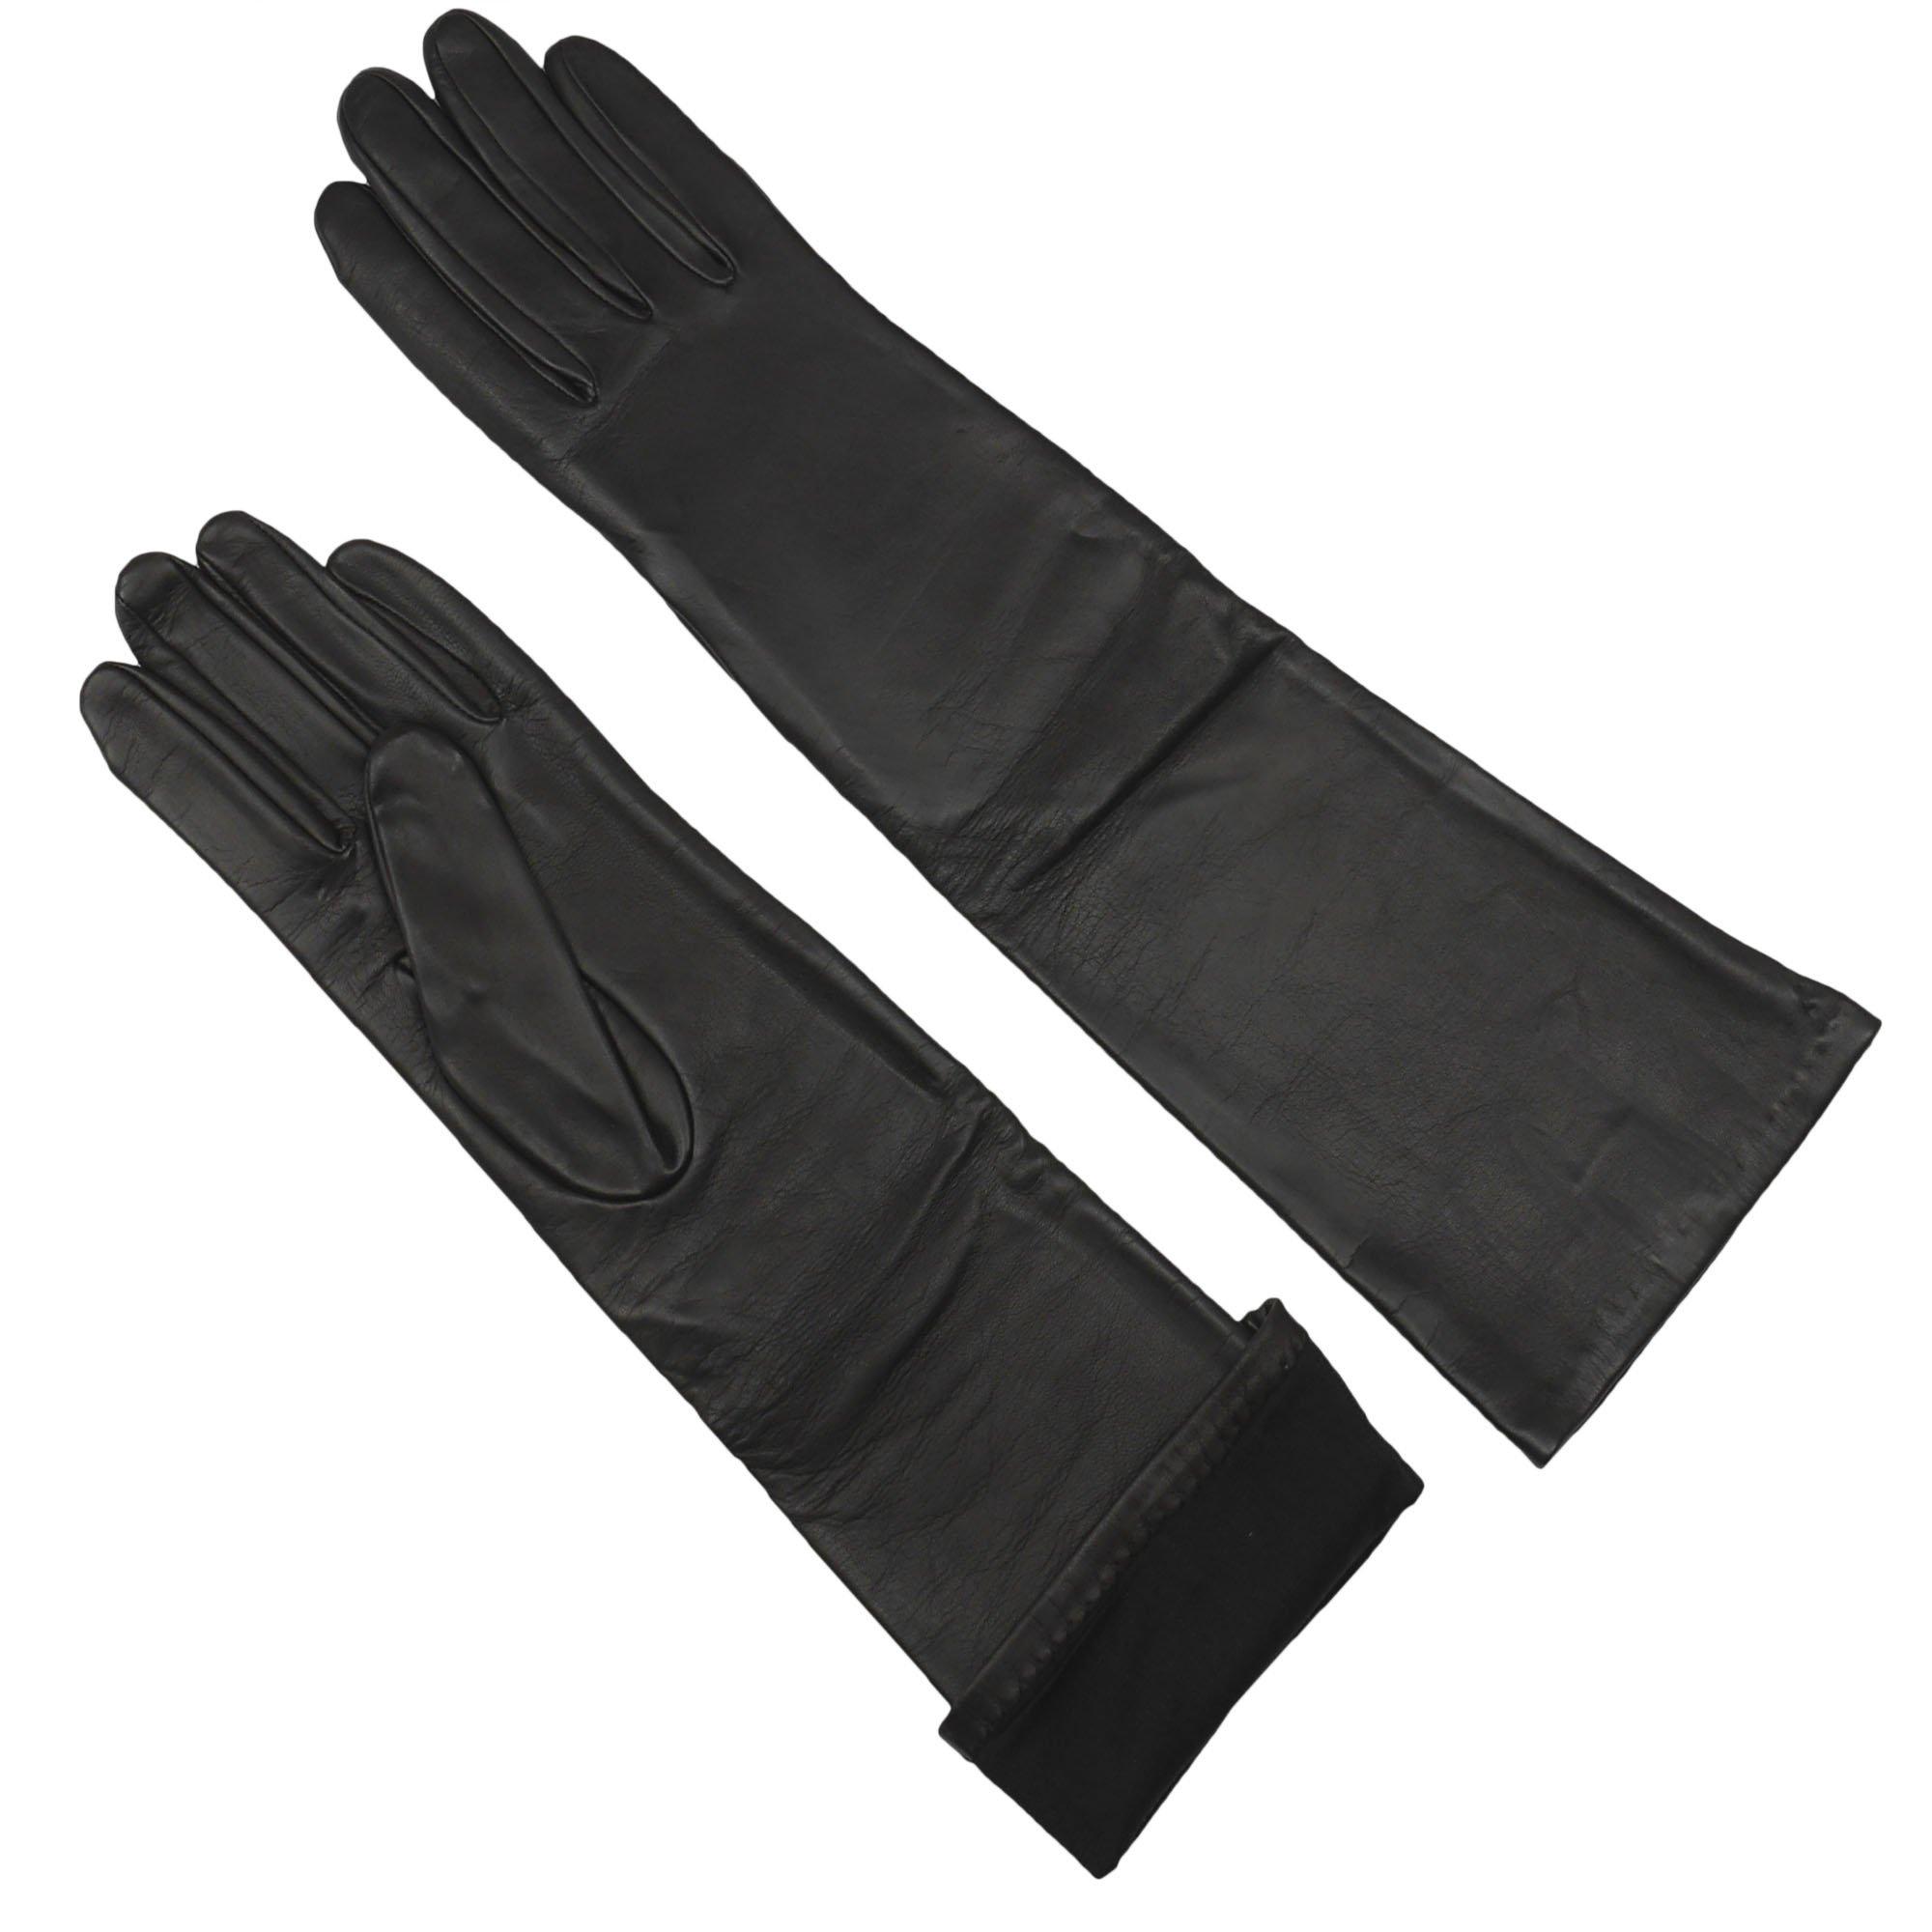 Long Opera Length Sheepskin Leather Gloves for Women   Silk Lined   16 inch by Grandoe (Brown 6.5 - S)